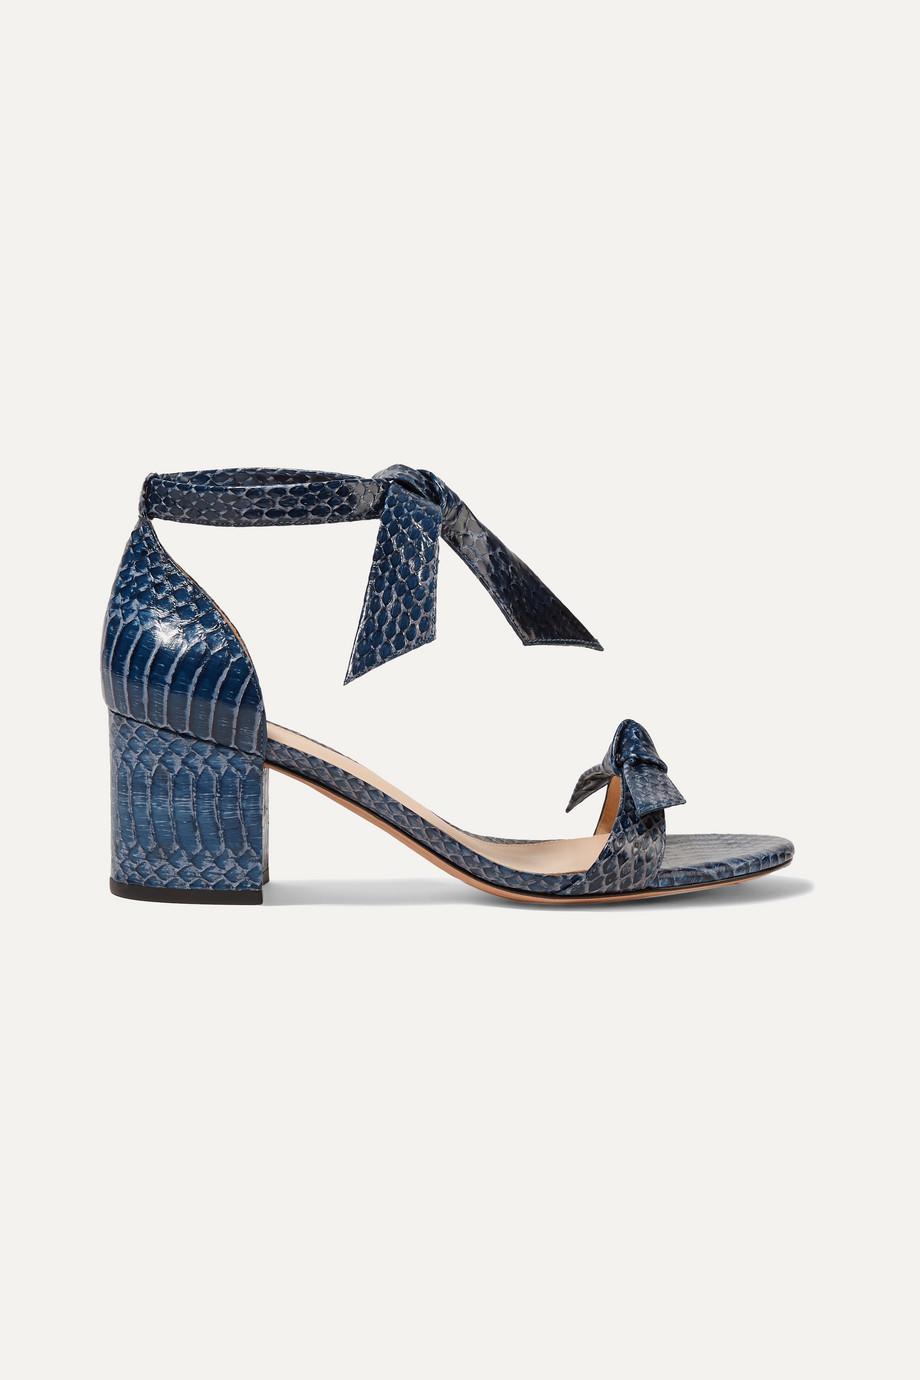 Alexandre Birman Clarita bow-embellished watersnake sandals